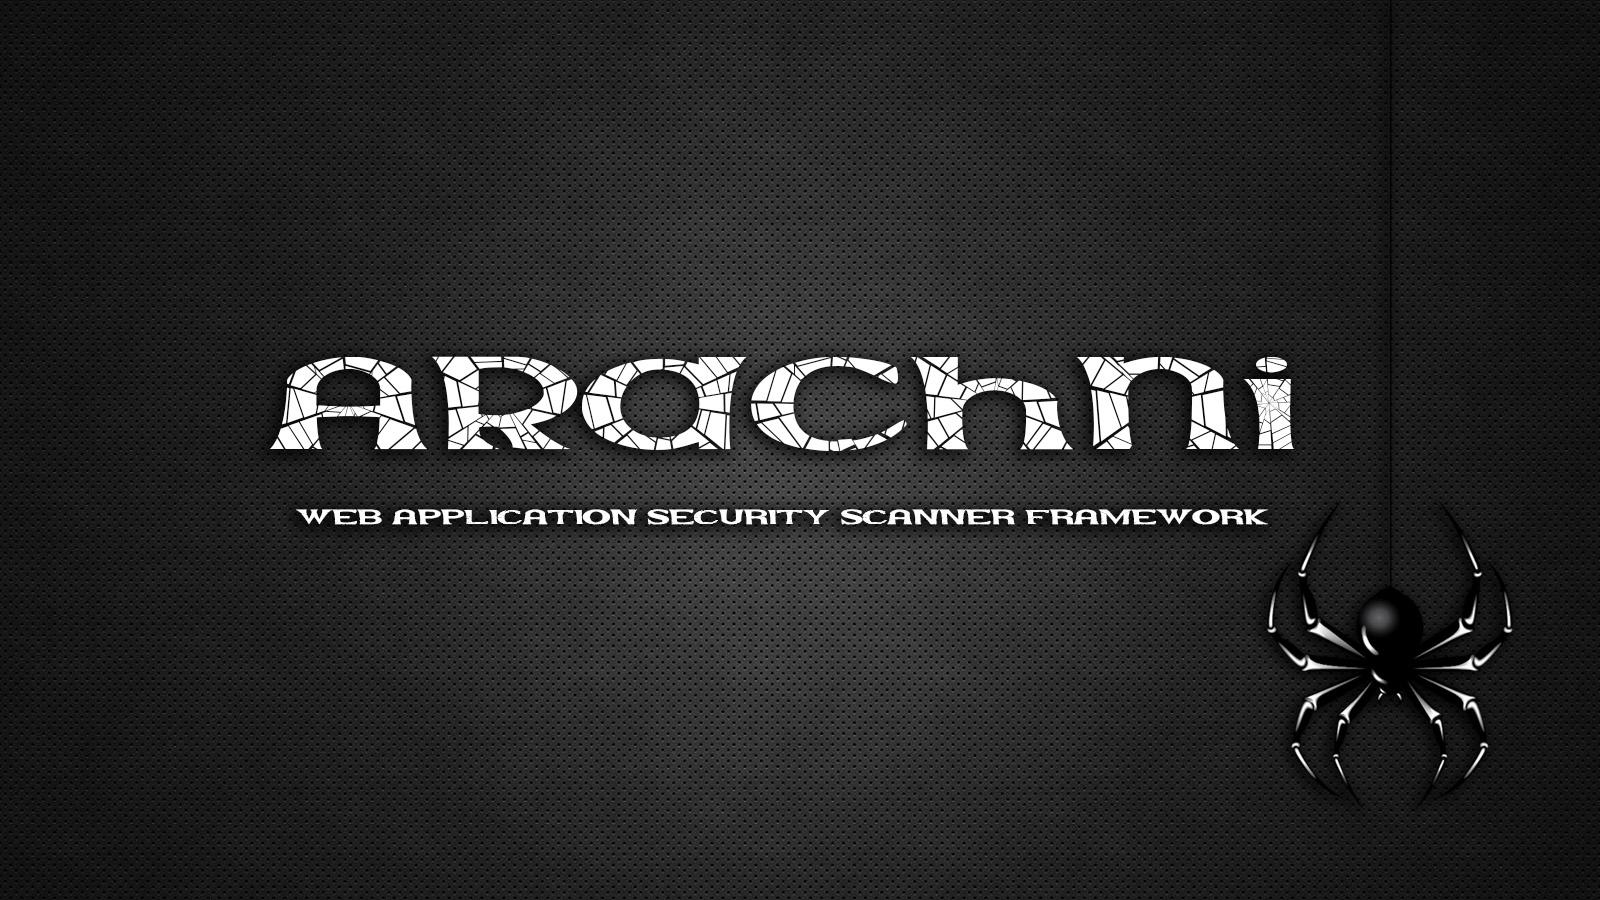 Arachni - Web Application Security Scanner Framework